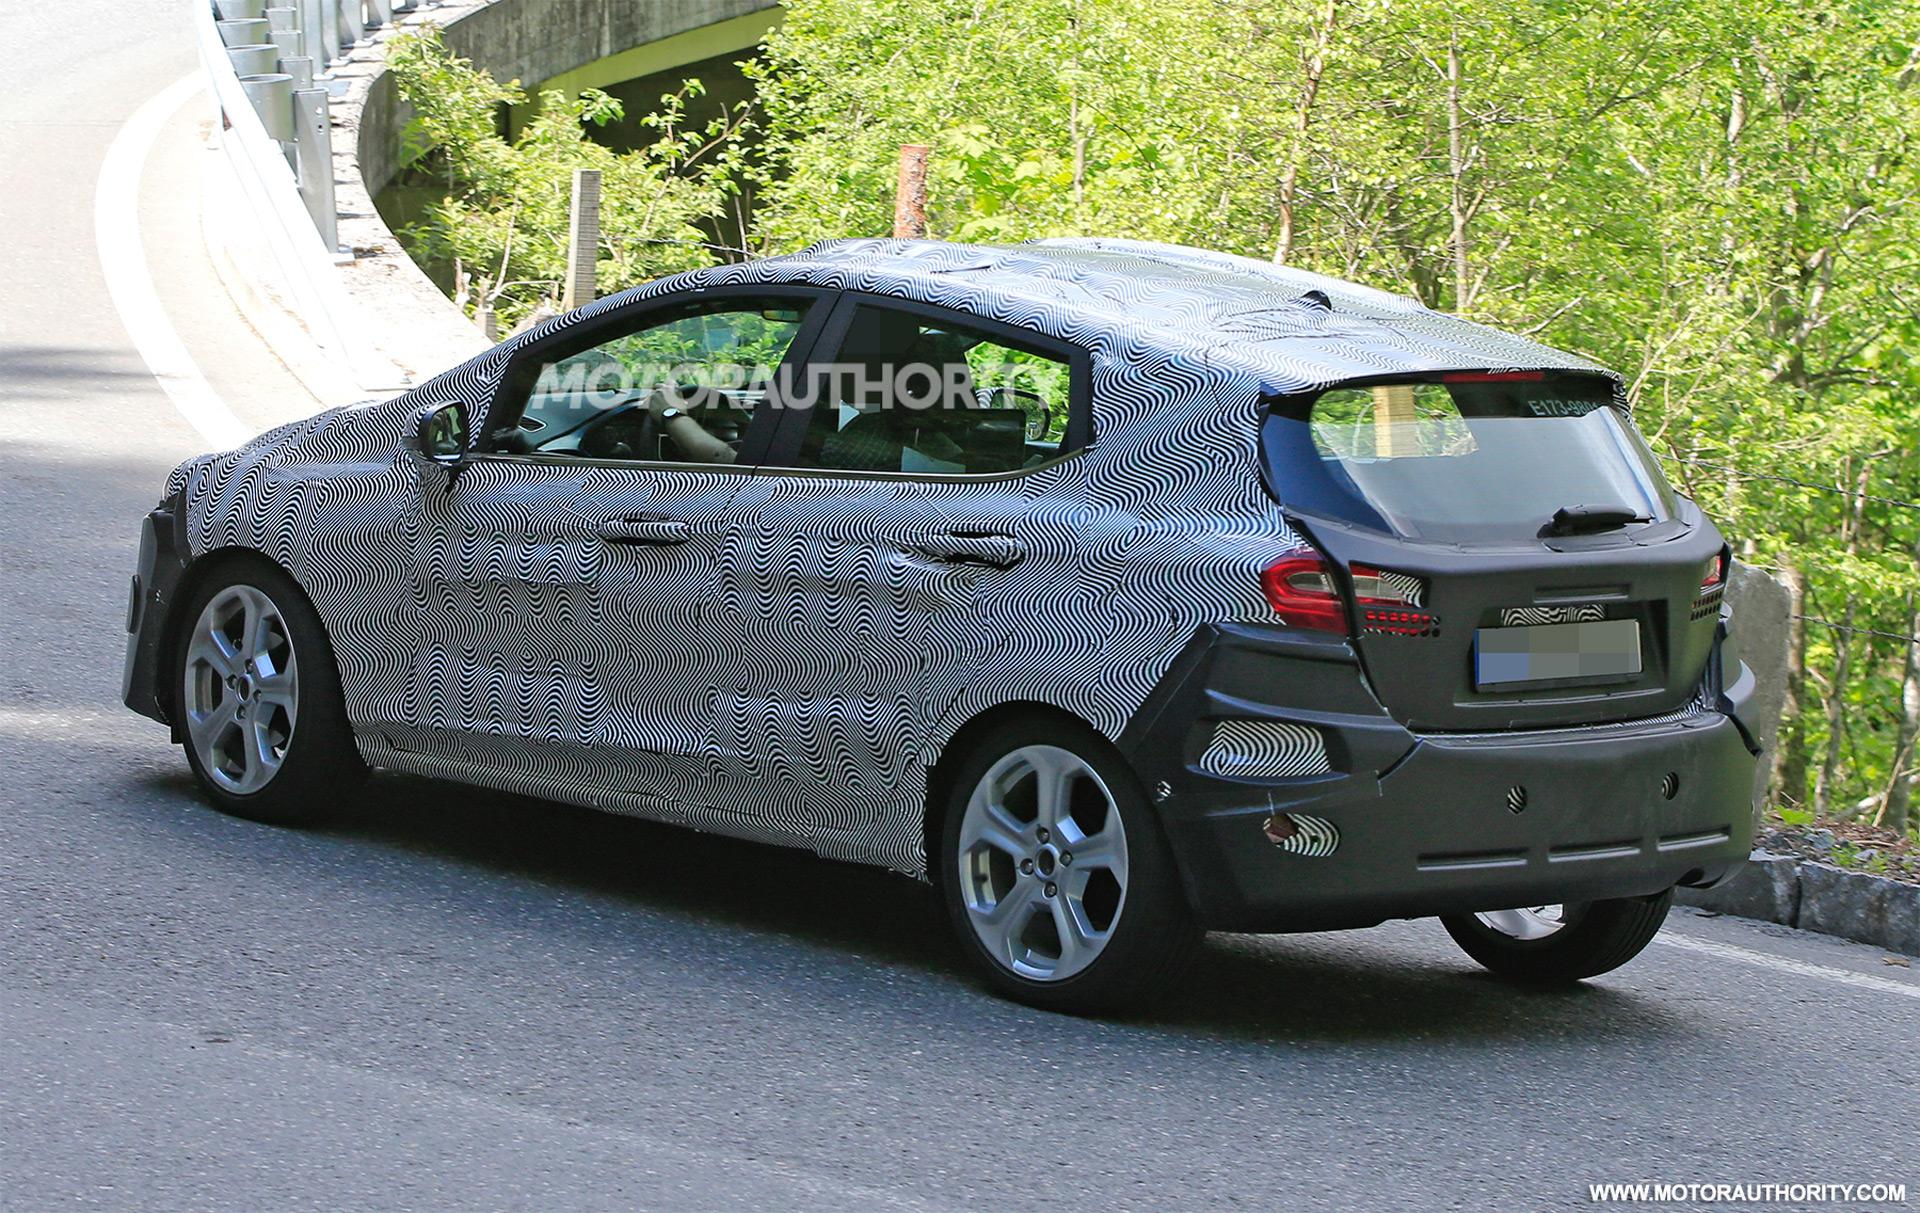 2017 - [Ford] Fiesta MkVII  - Page 3 2018-ford-fiesta-spy-shots--image-via-s-baldauf-sb-median_100555631_h